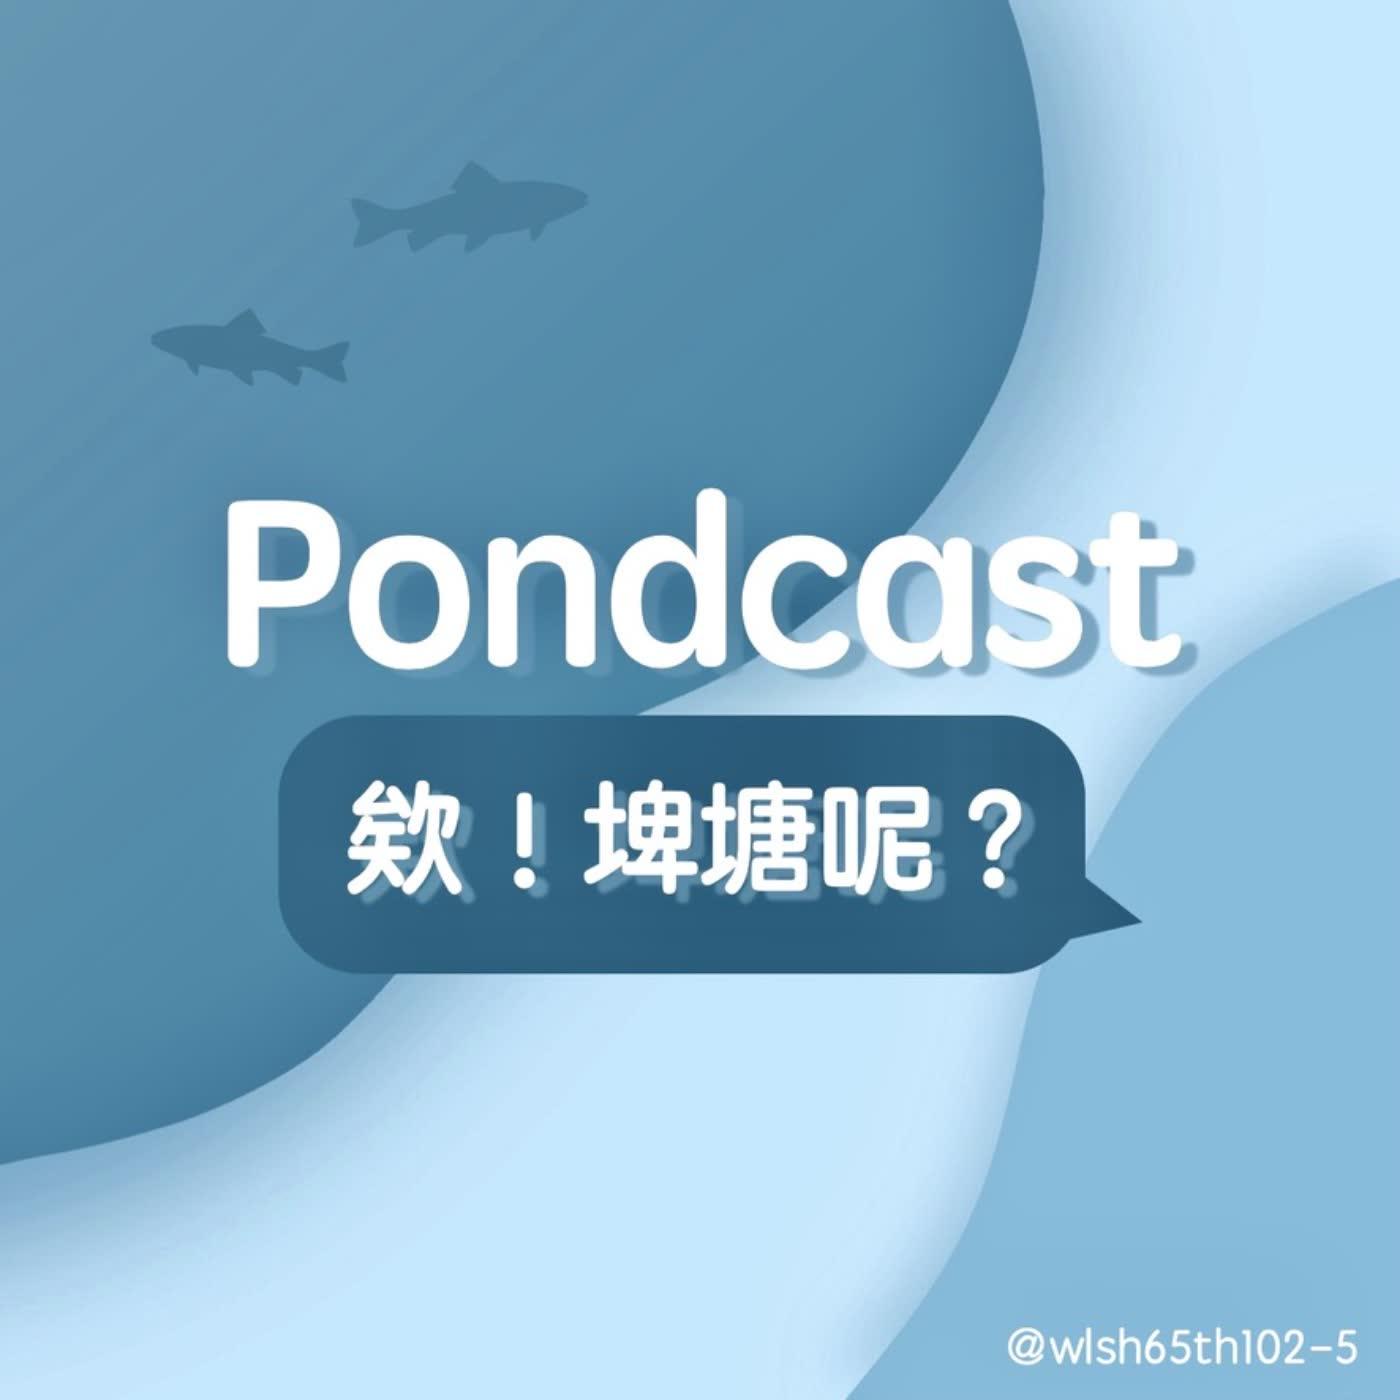 Pondcast:欸!埤塘呢?